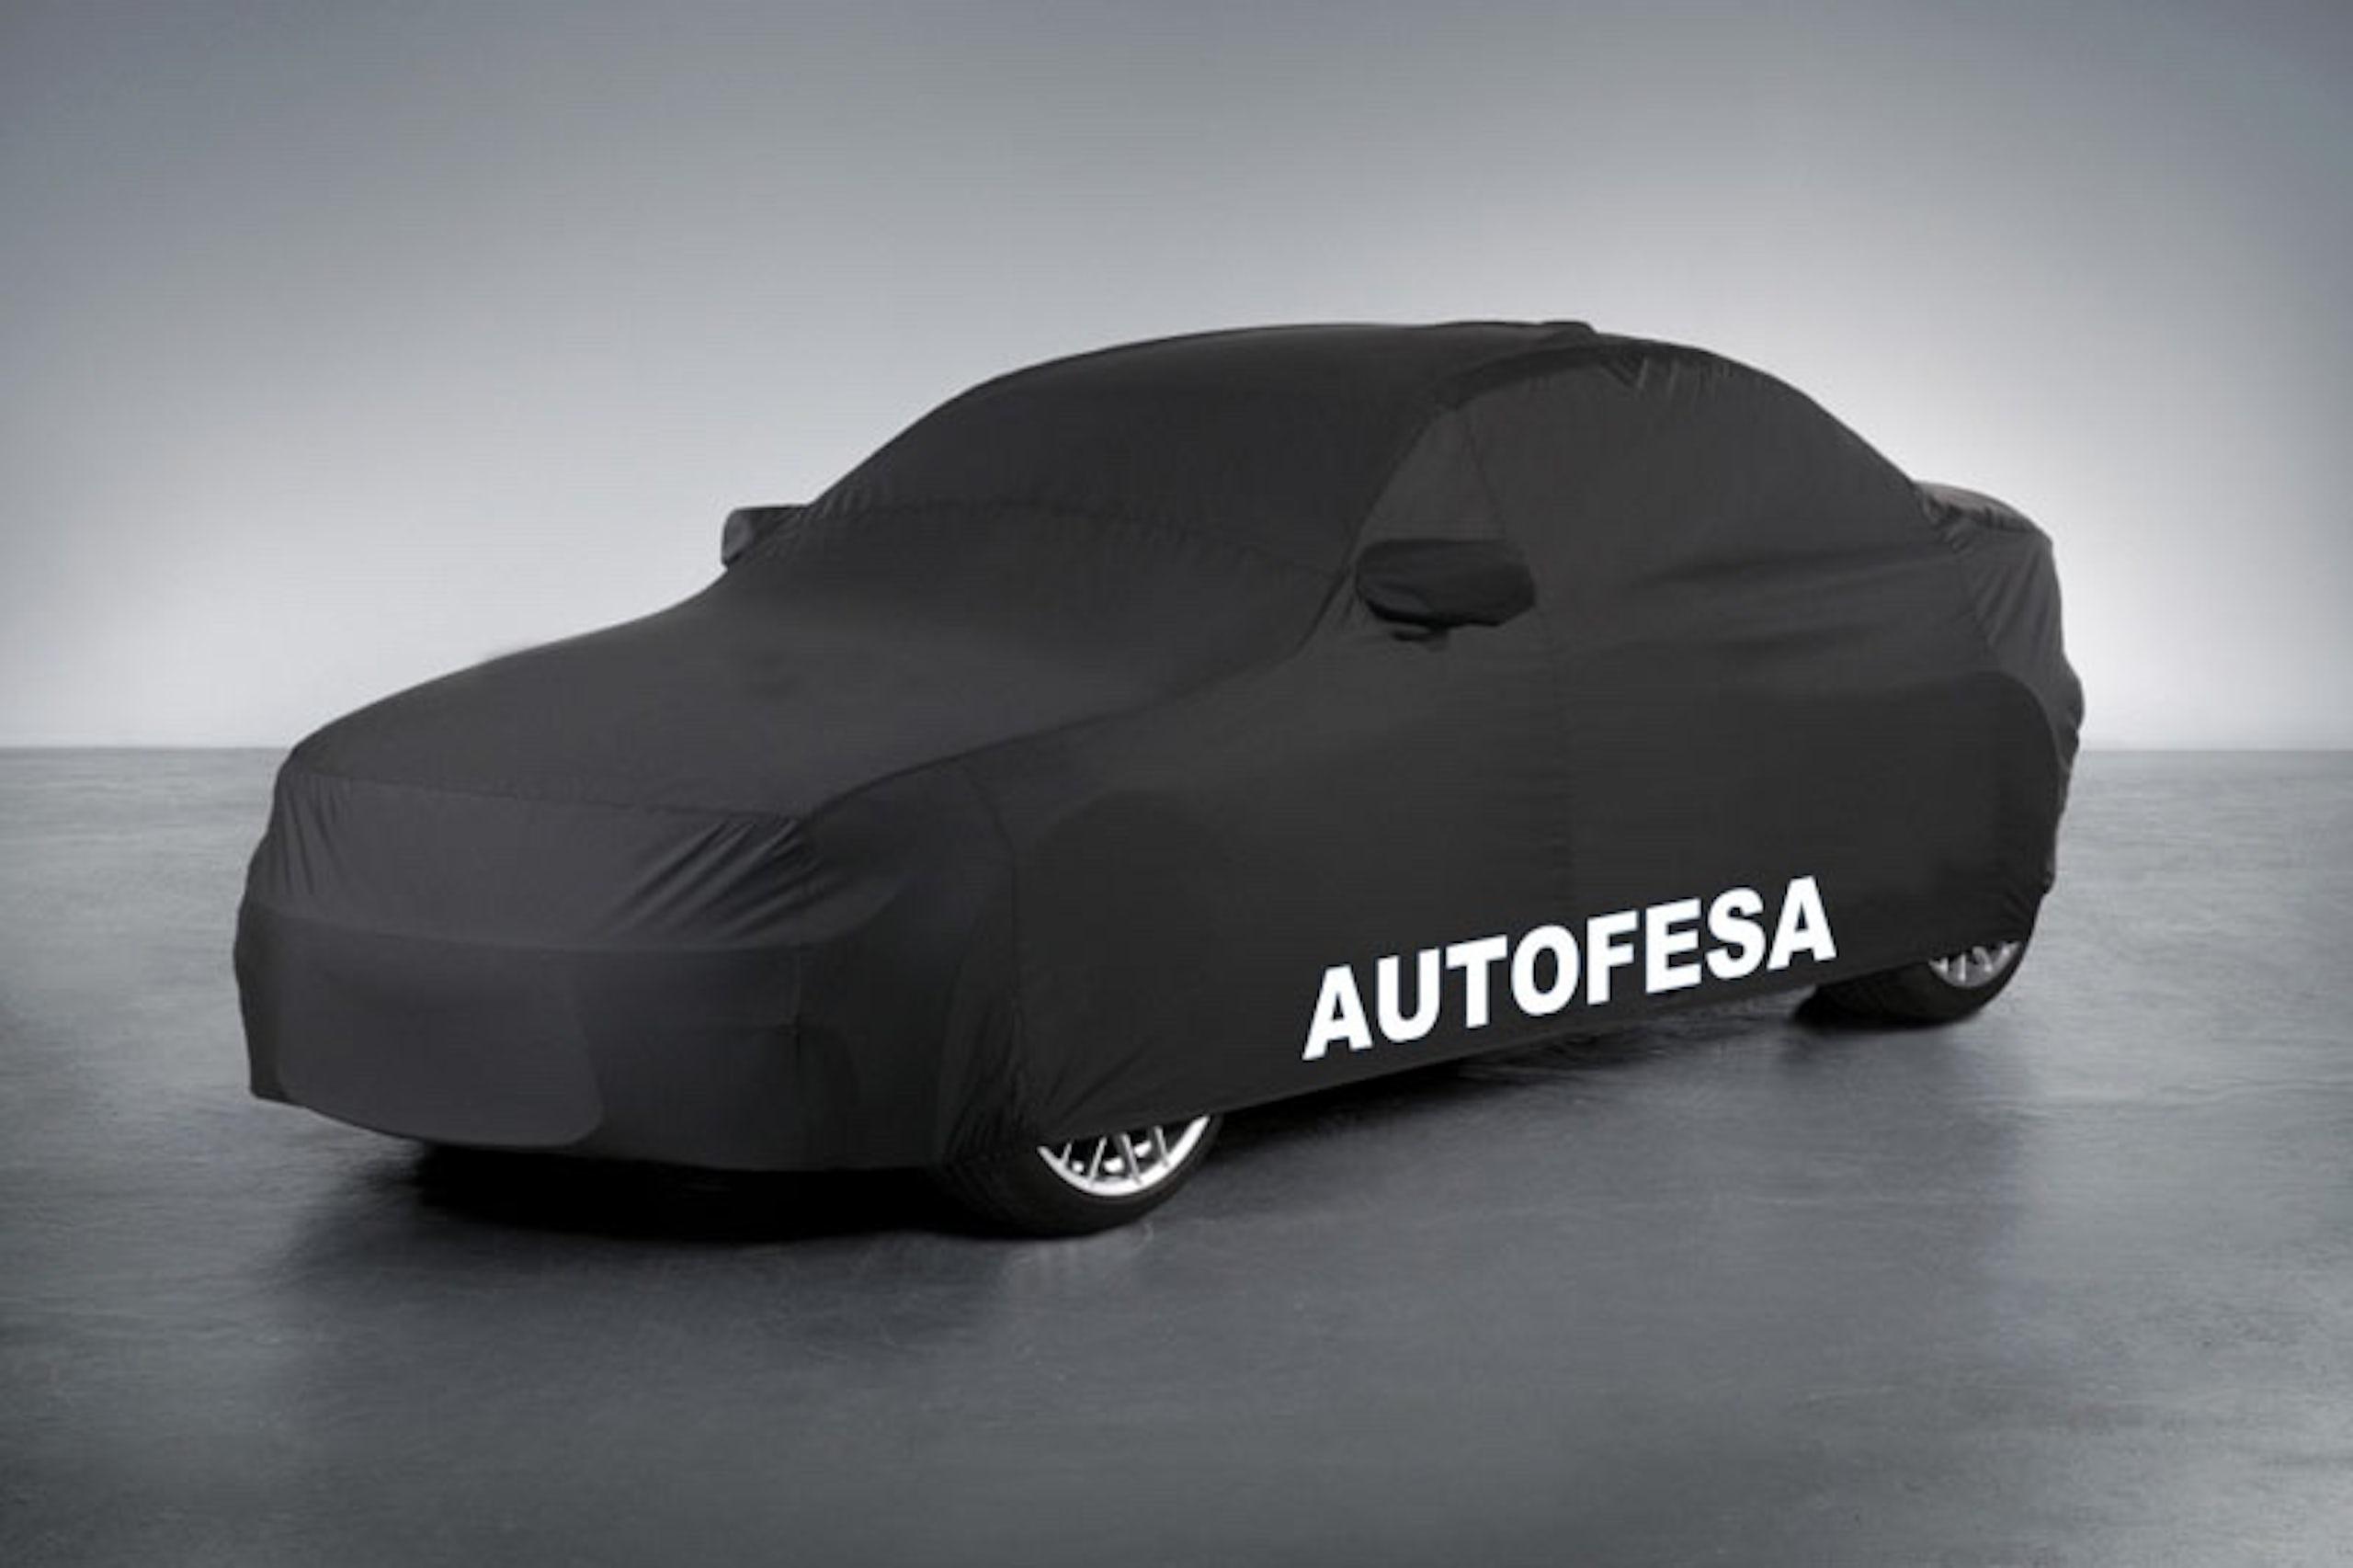 Mitsubishi Outlander 2.0 DI-D 150cv Motion 2WD 5p 7plz Auto S/S - Foto 22